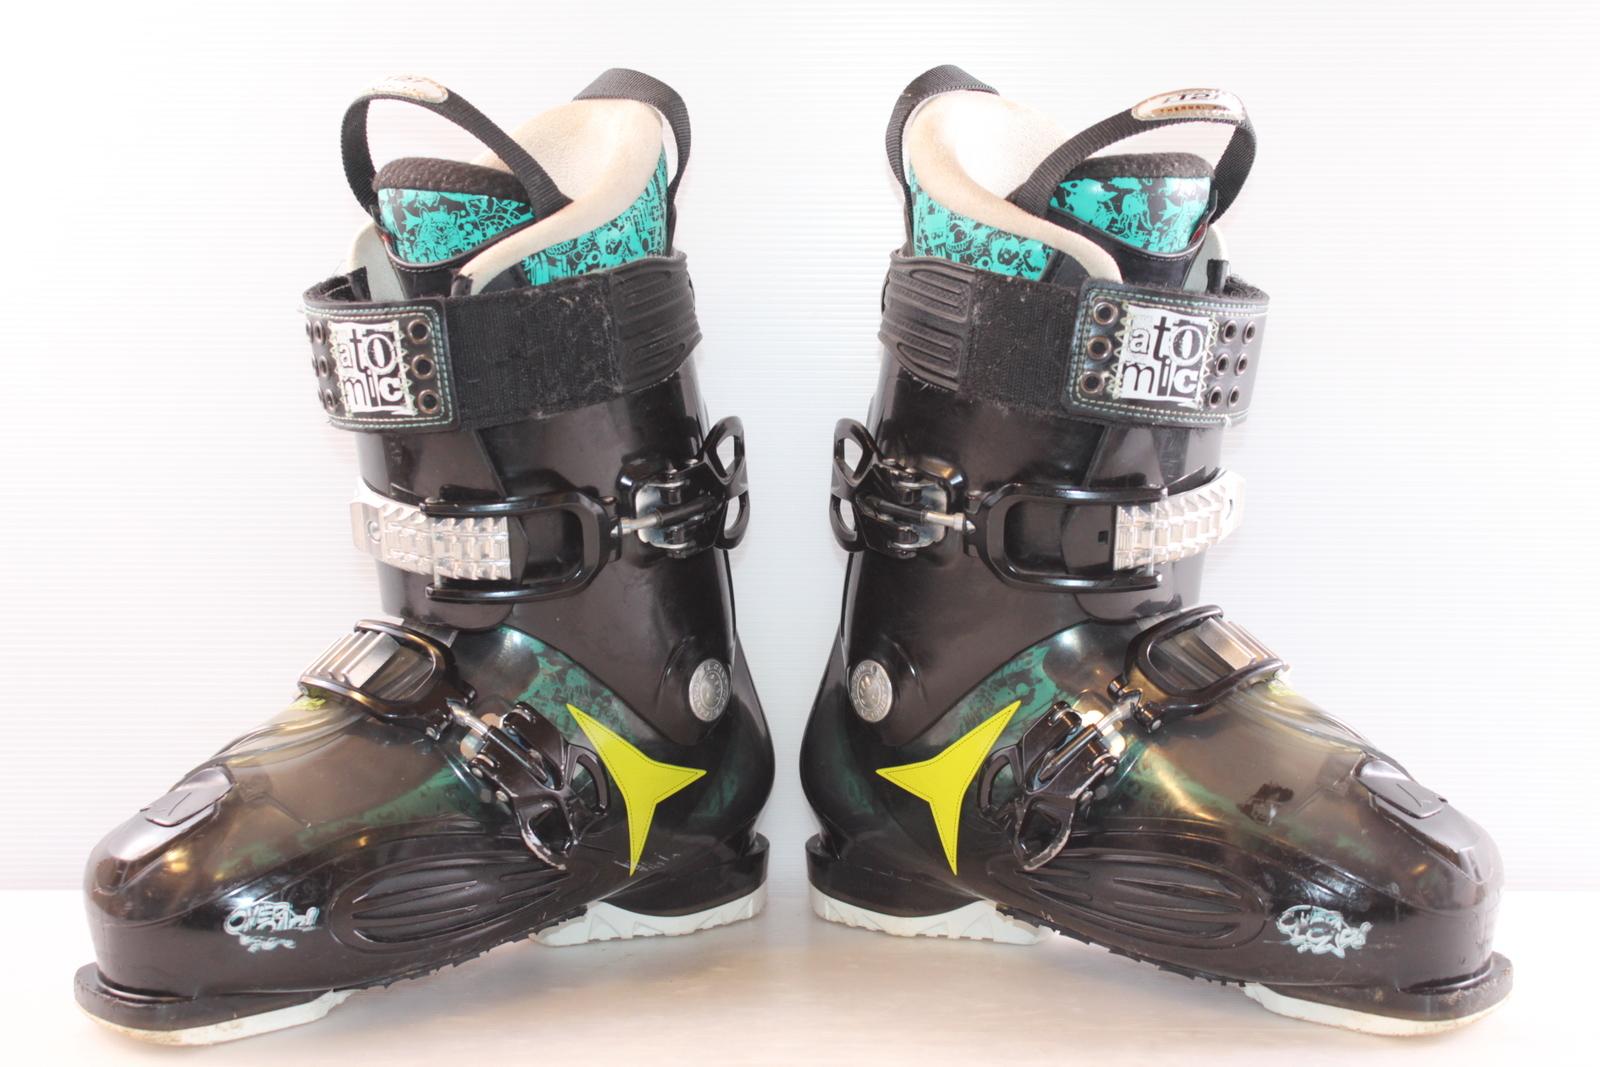 ca93ad696c0 Lyžařské boty Atomic Overload vel. EU42.5